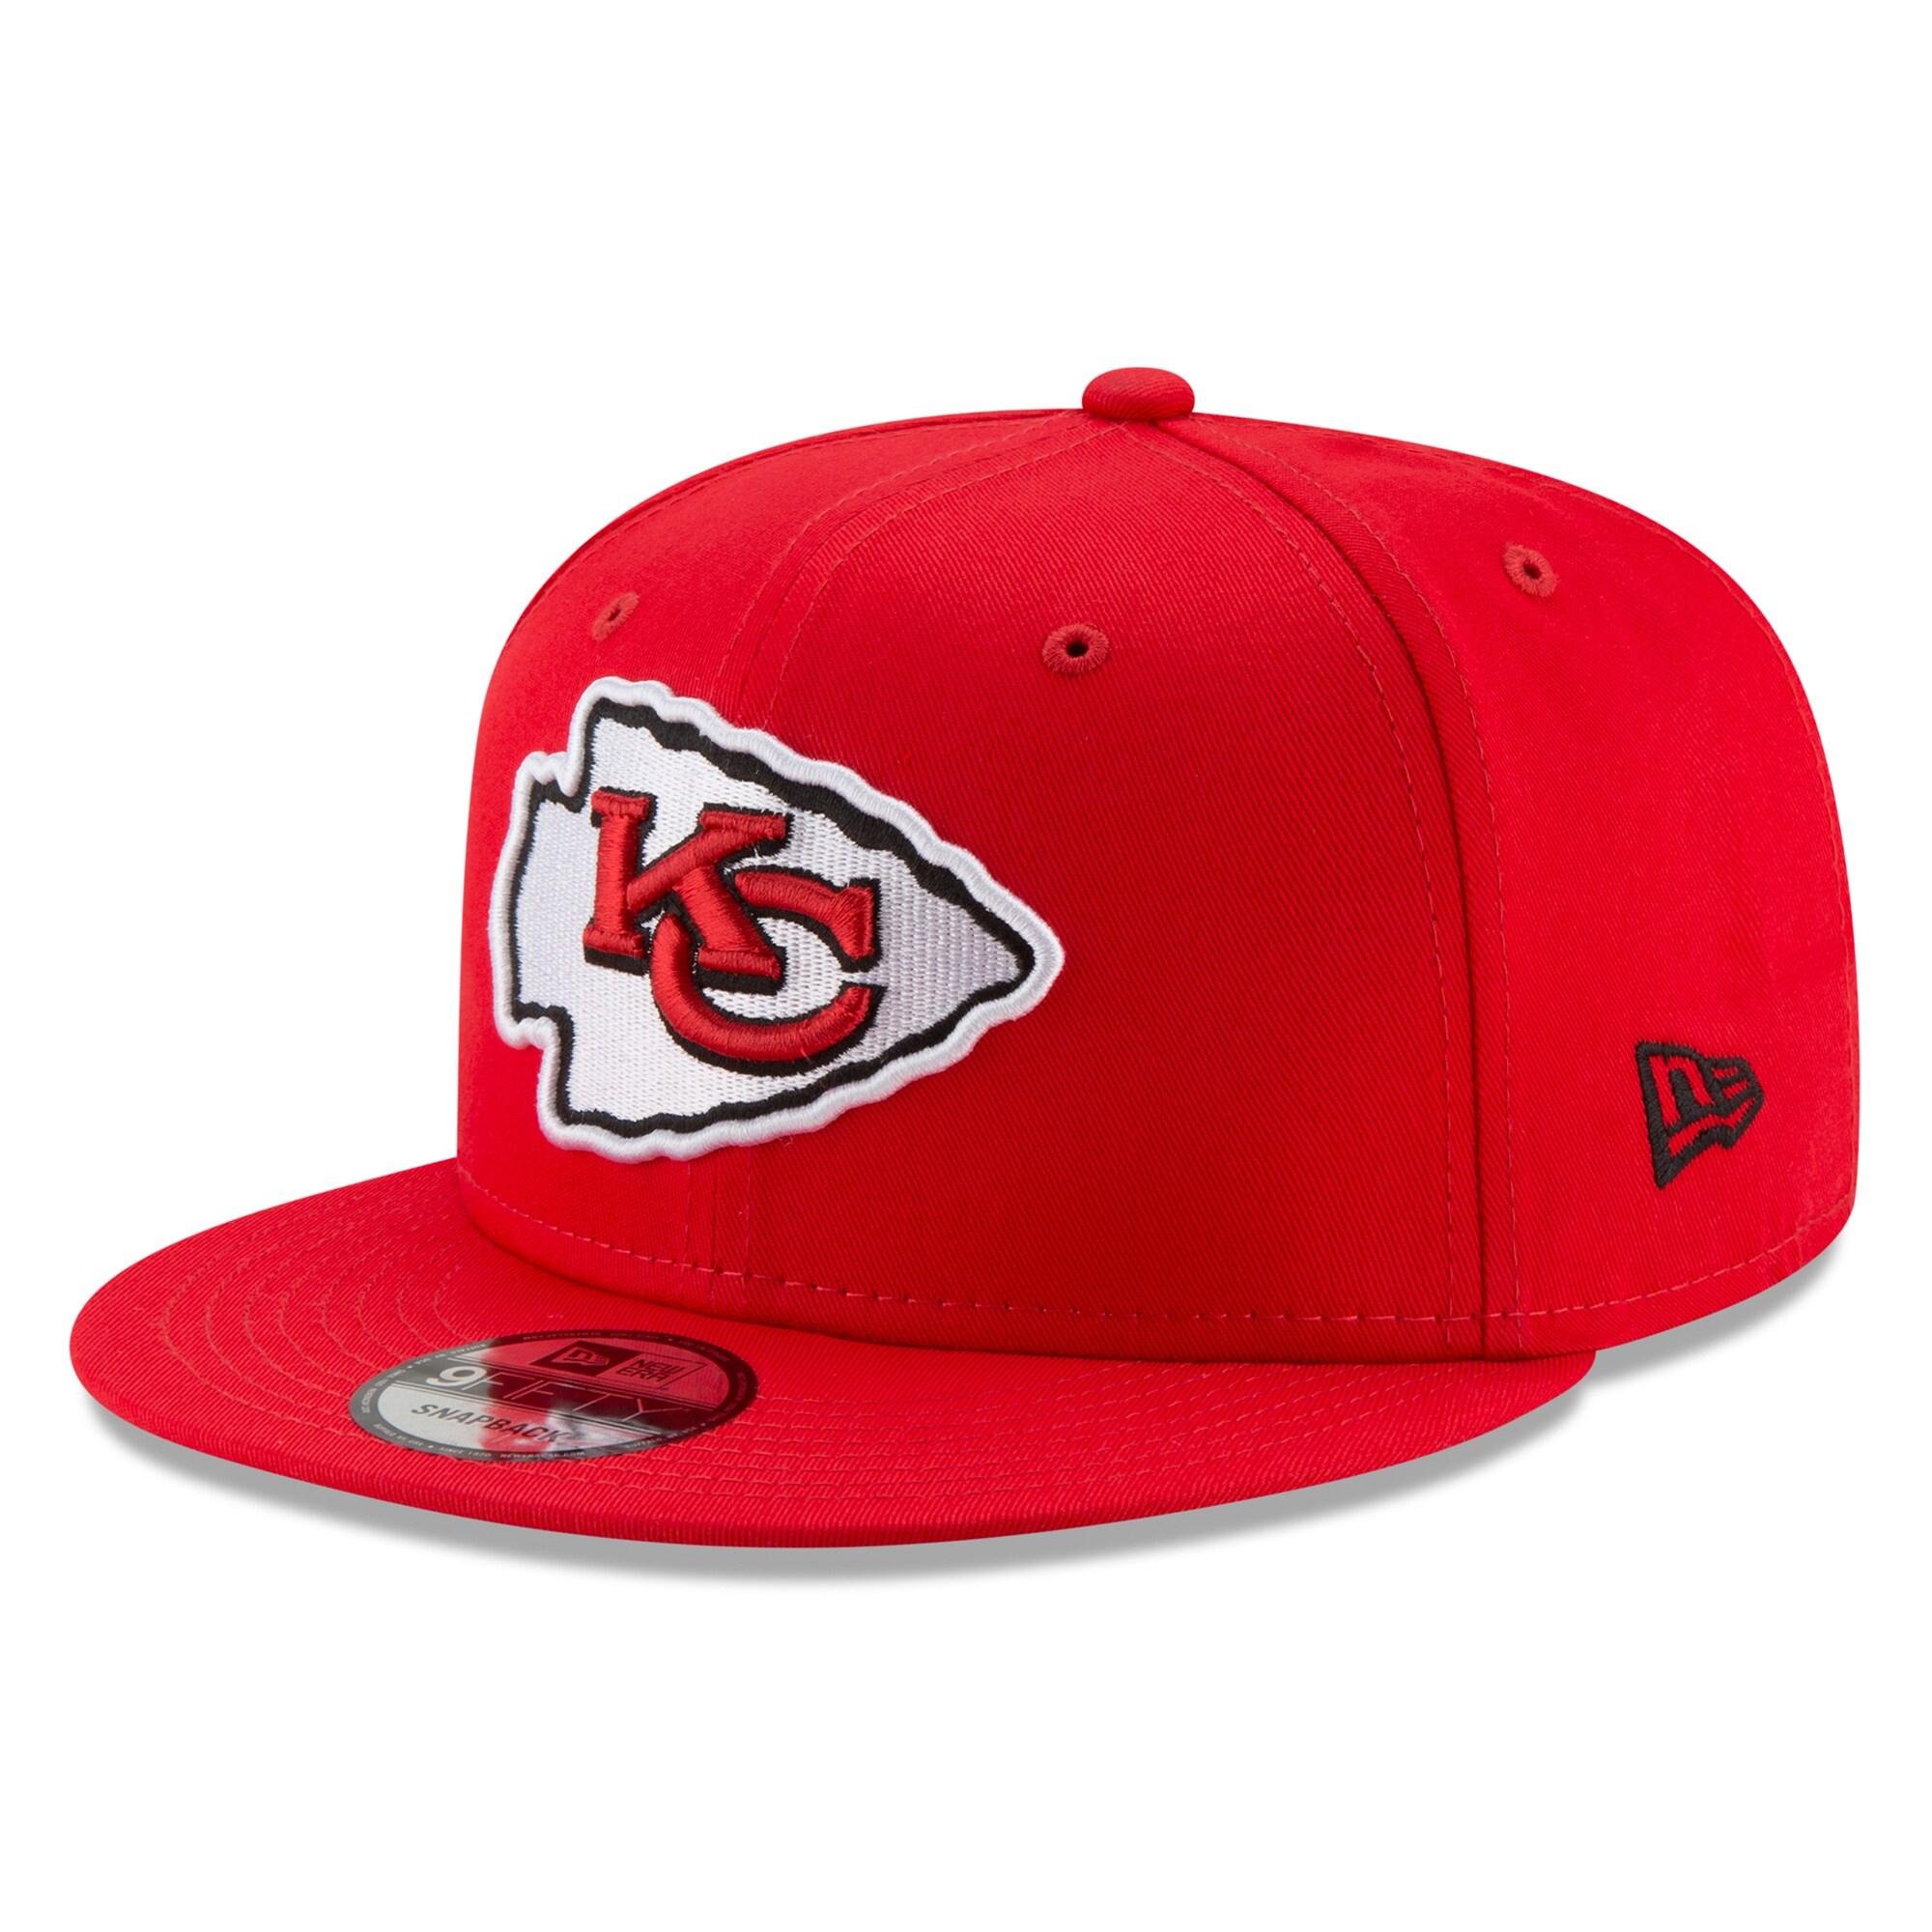 Kansas City Chiefs New Era Basic 9FIFTY Adjustable Snapback Hat - Red